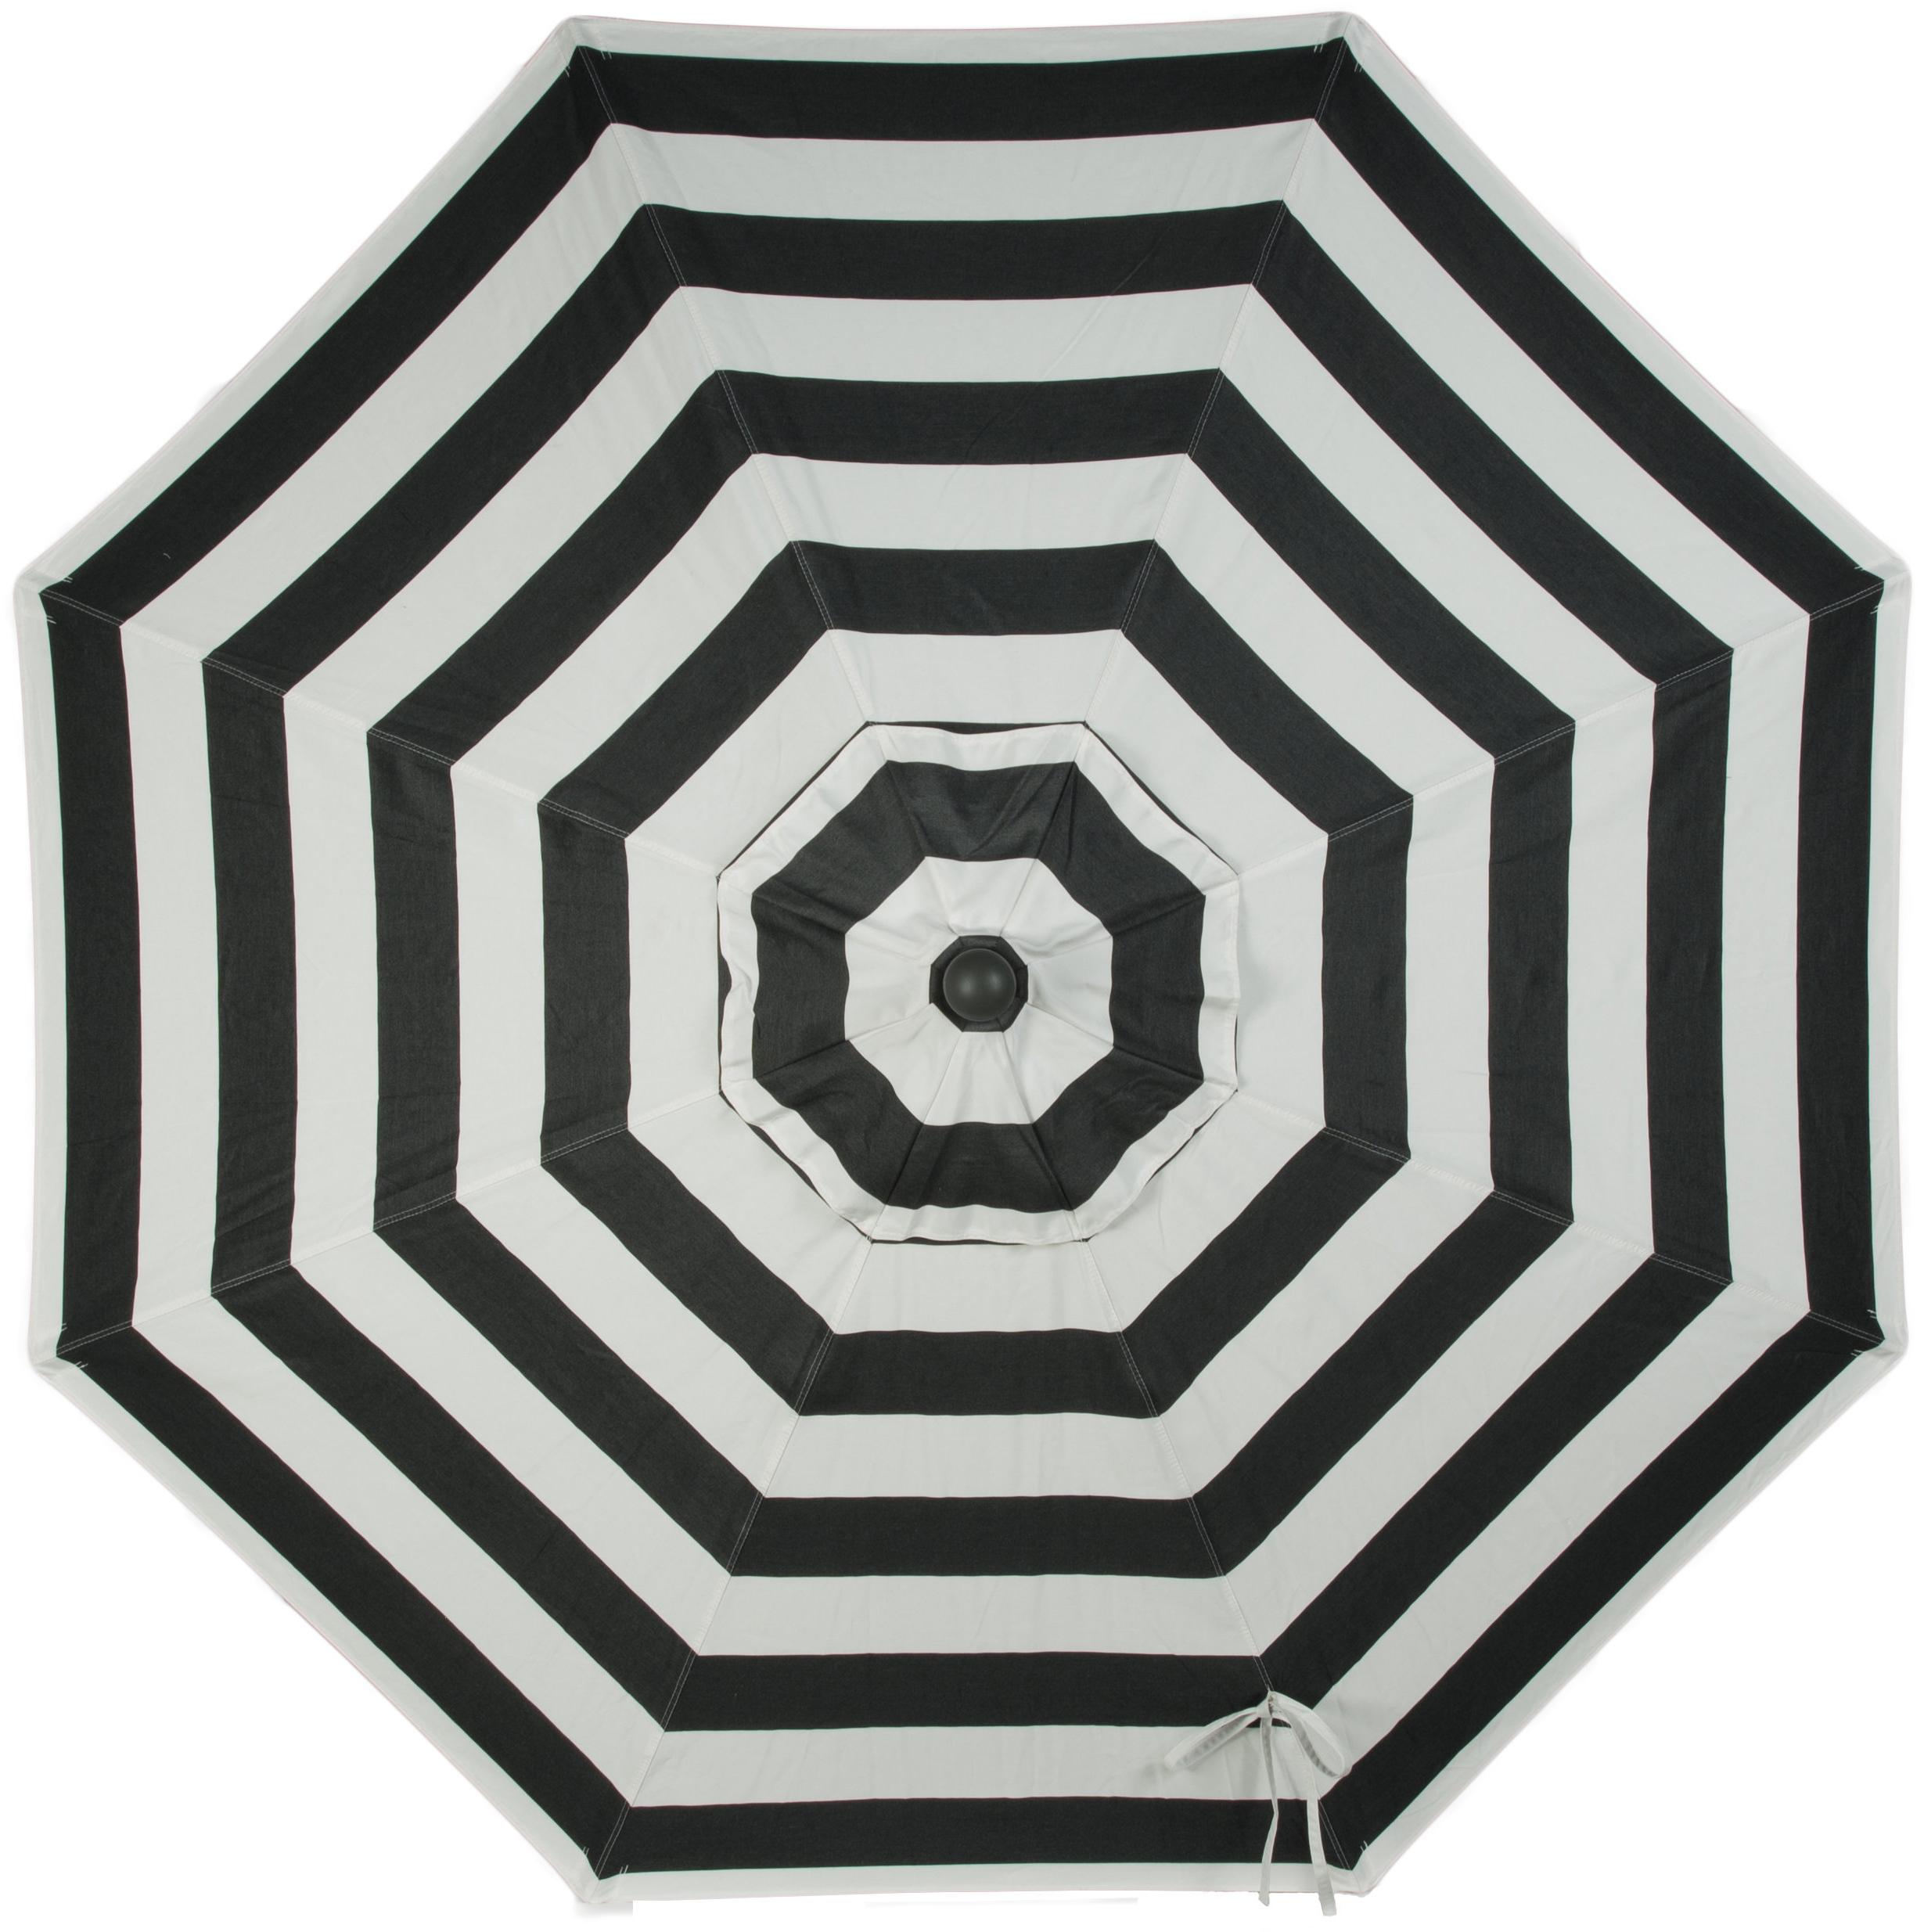 Wiebe Auto Tilt 9' Market Umbrella With Most Recently Released Wiebe Auto Tilt Square Market Sunbrella Umbrellas (View 3 of 20)